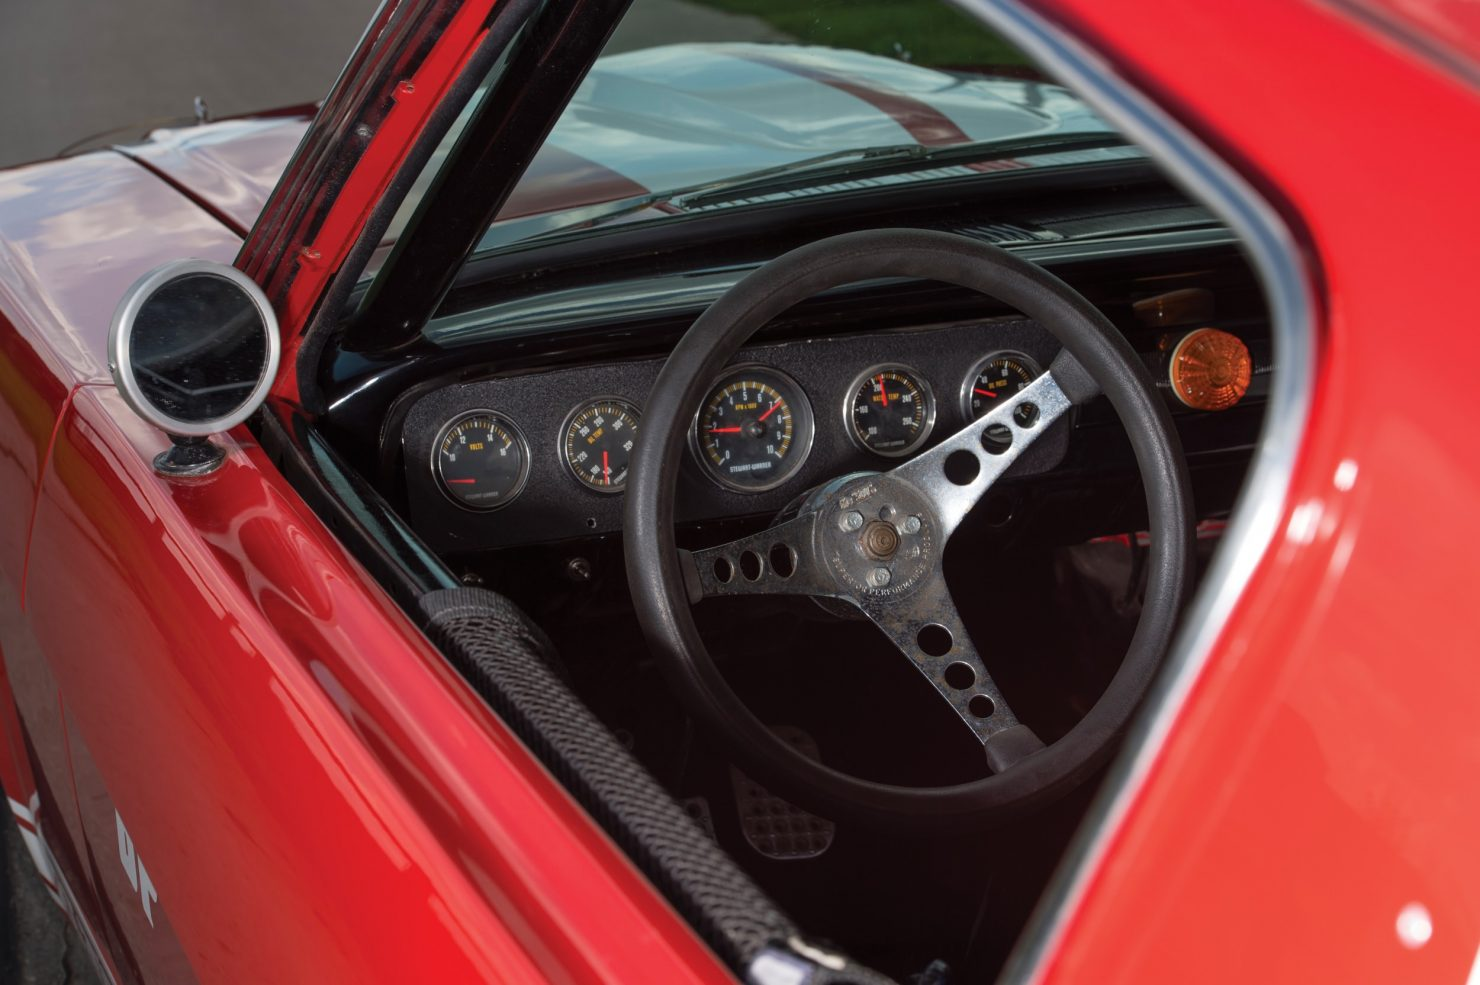 shelby gt350 race car 11 1480x985 - 1966 Shelby GT350 - Period SCCA Race Car